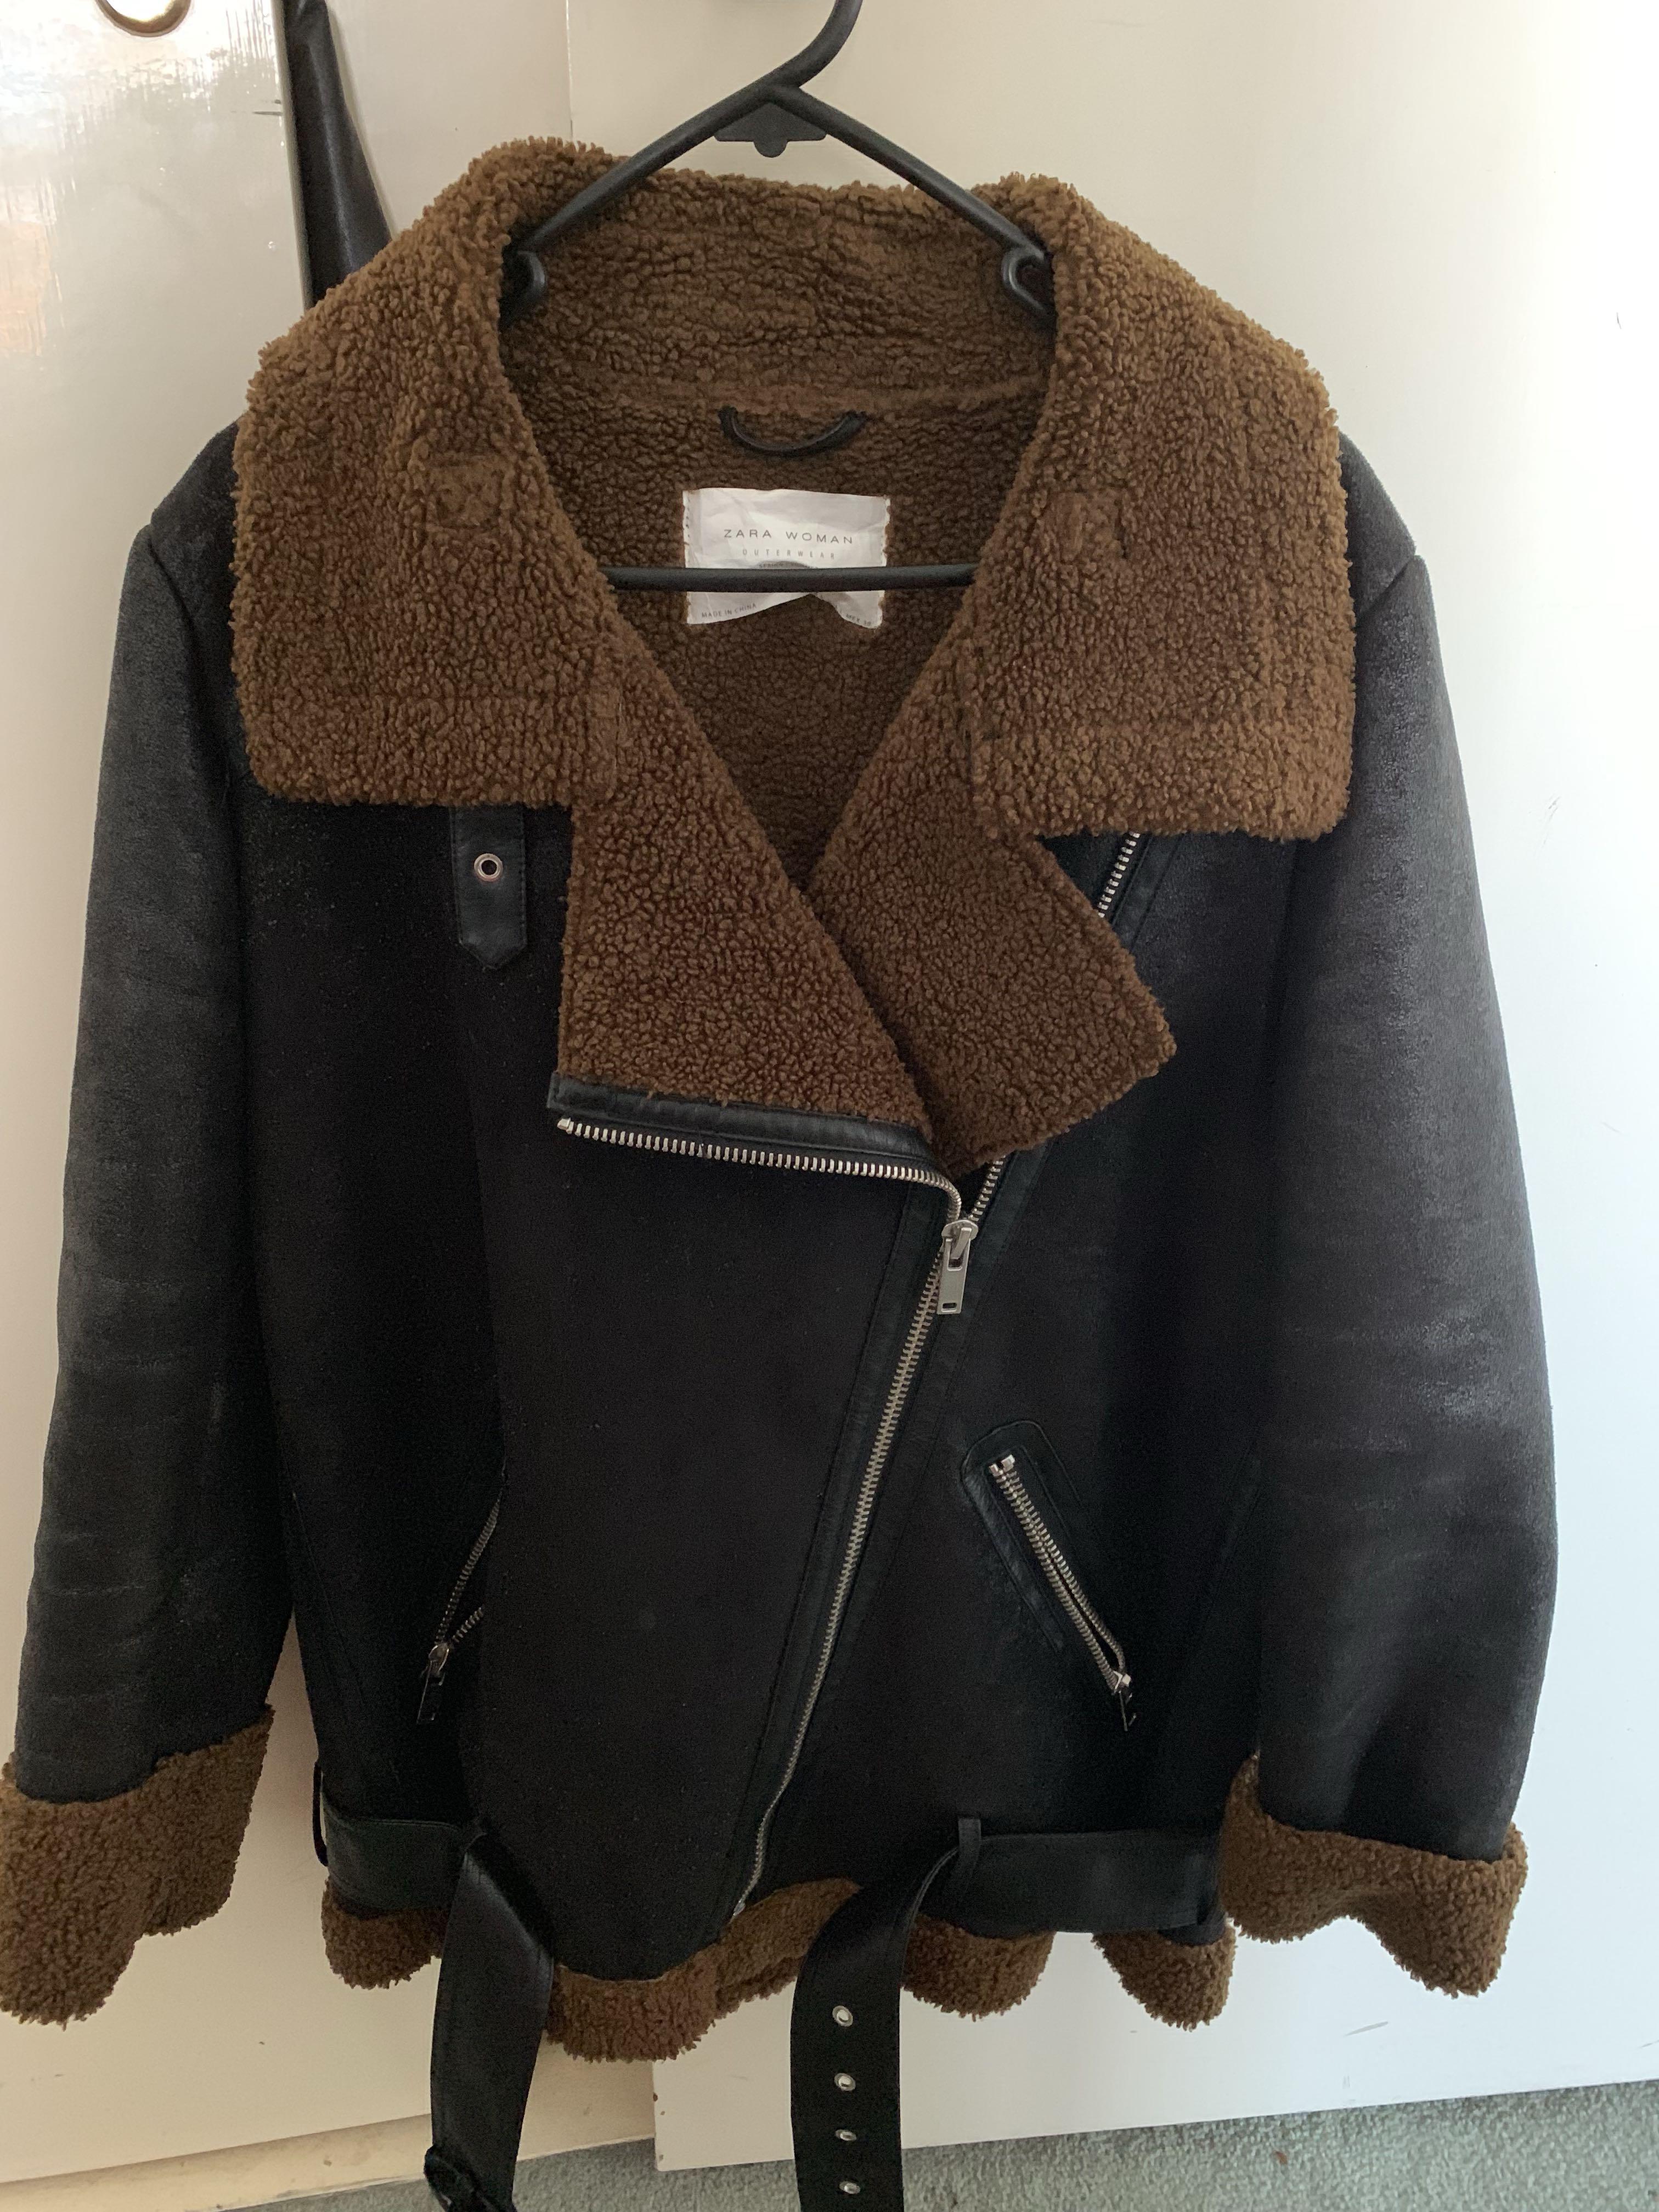 Zara aviator jacket large suit medium to large very good condition